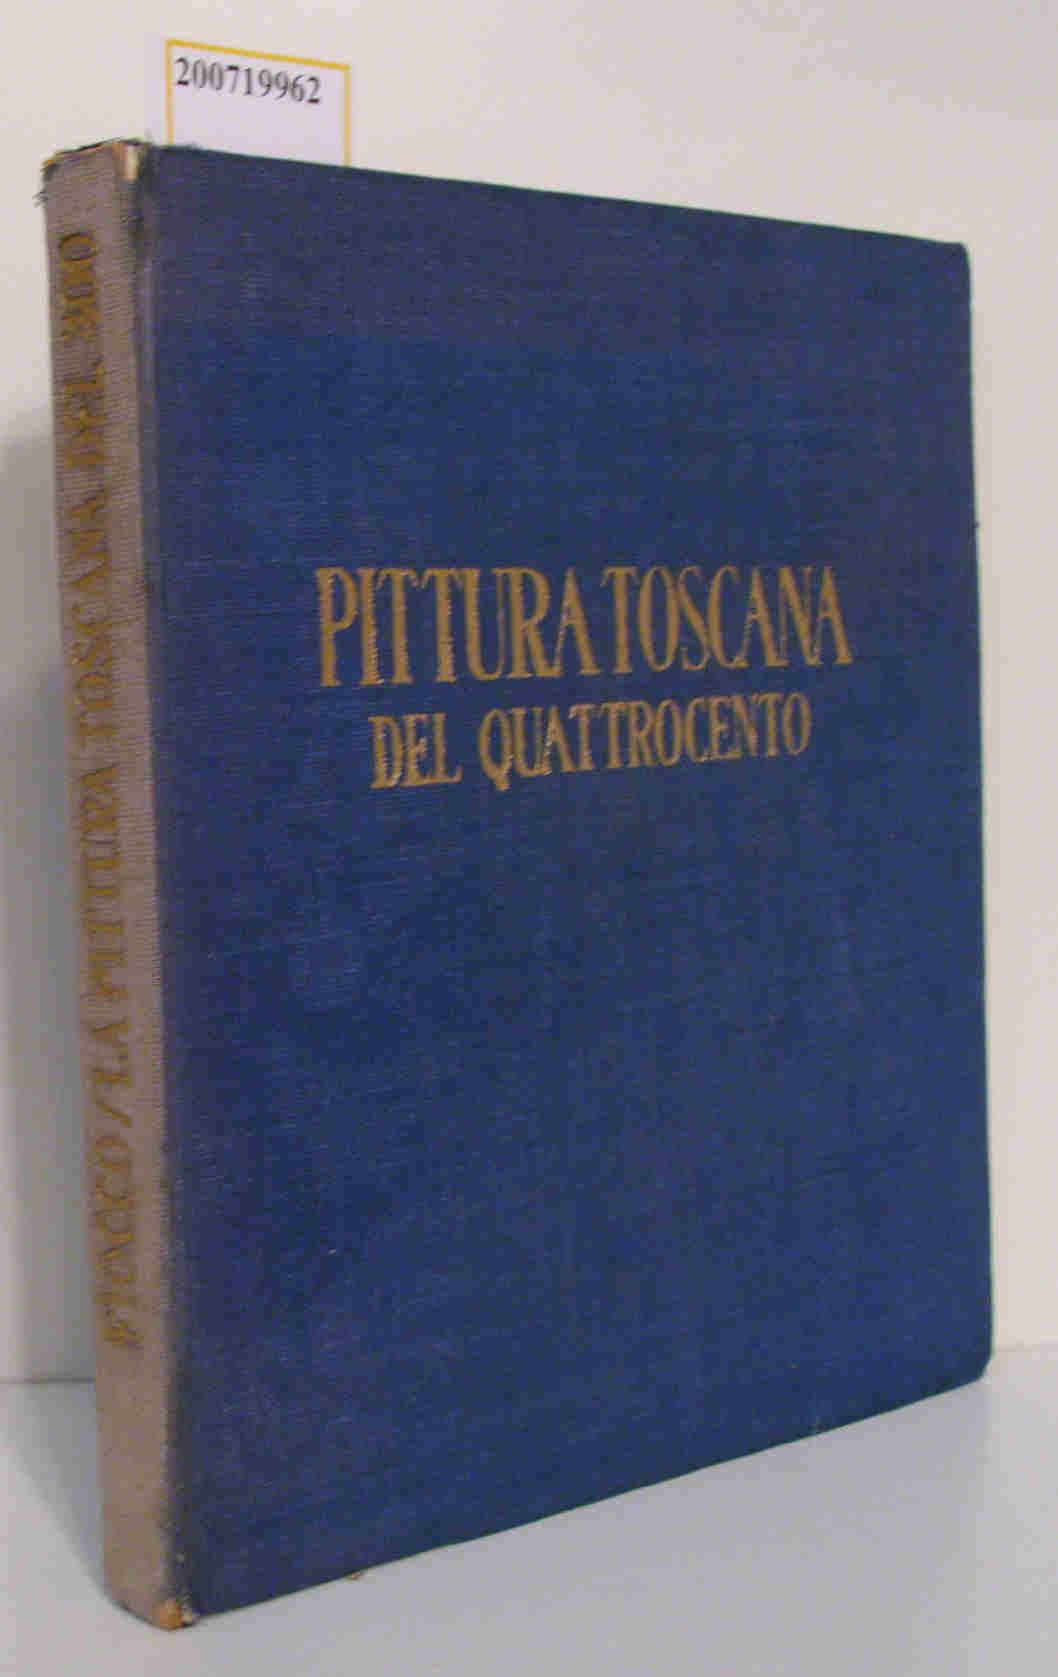 La Pittura Toscana del Quattrocento